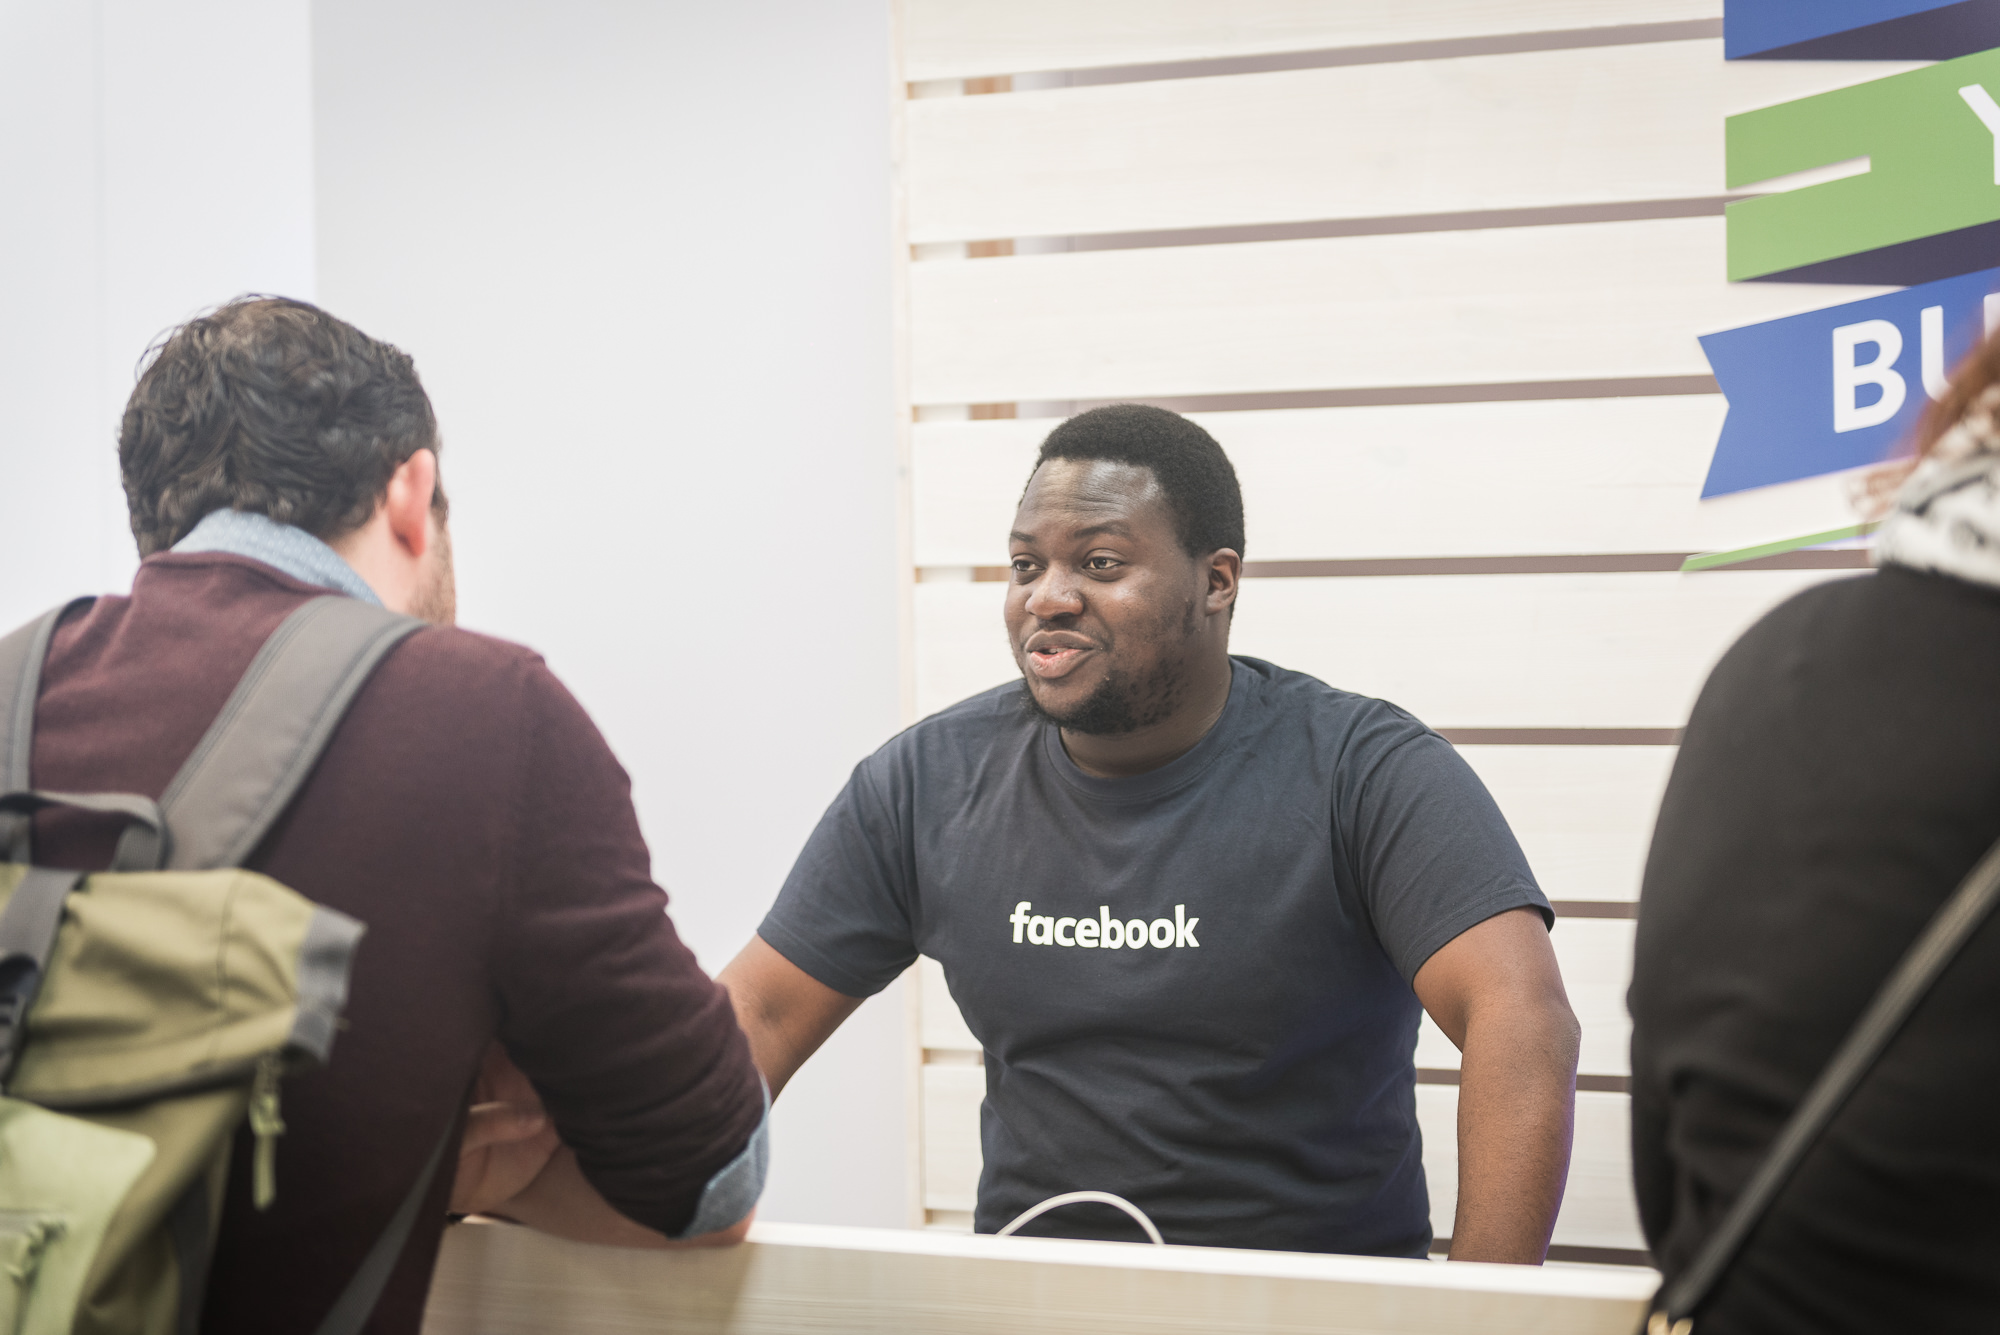 facebook-boost-your-business-gruppo-peroni-eventi-06